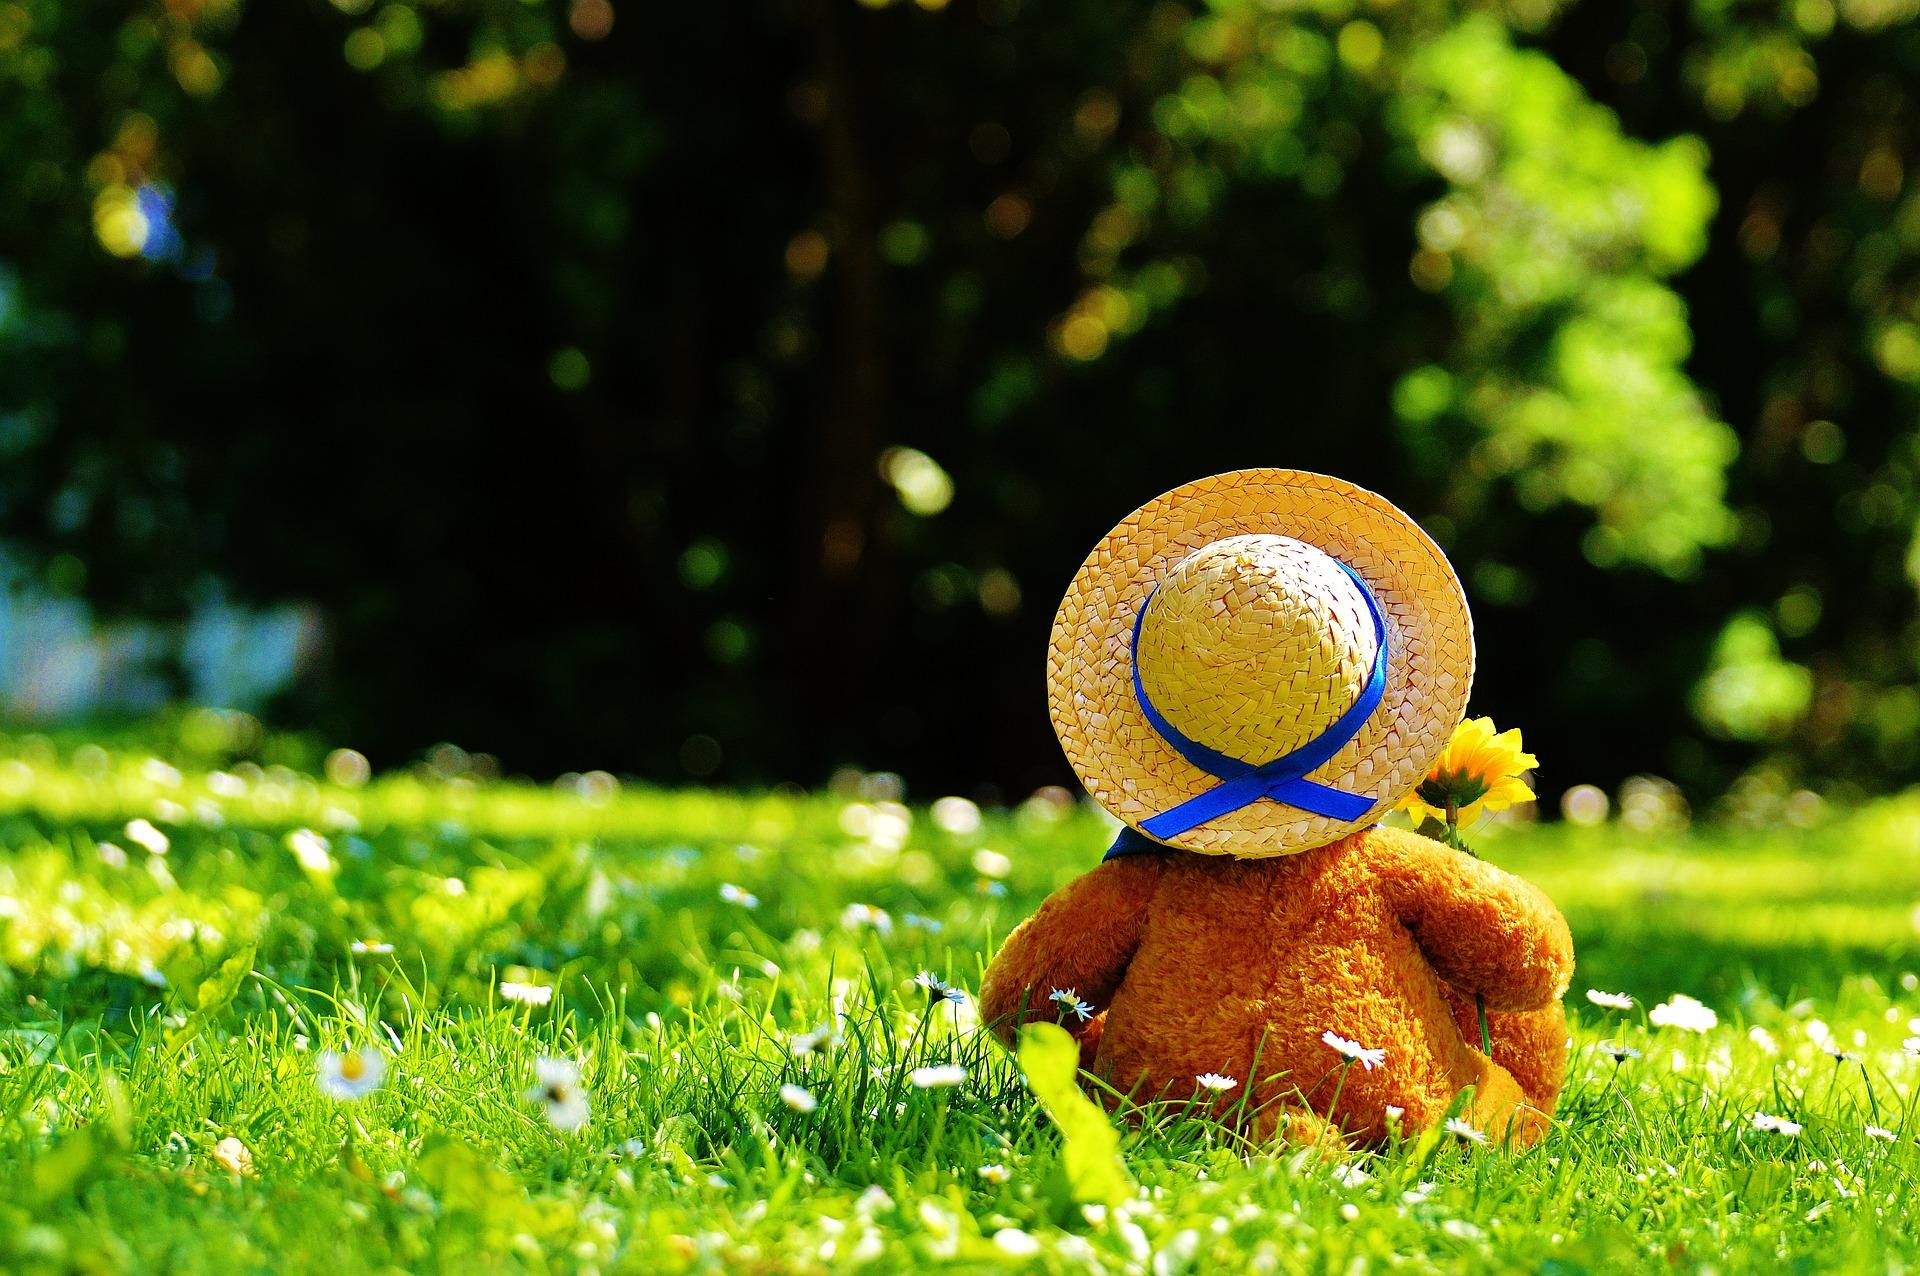 teddy-bear-797577_1920.jpg